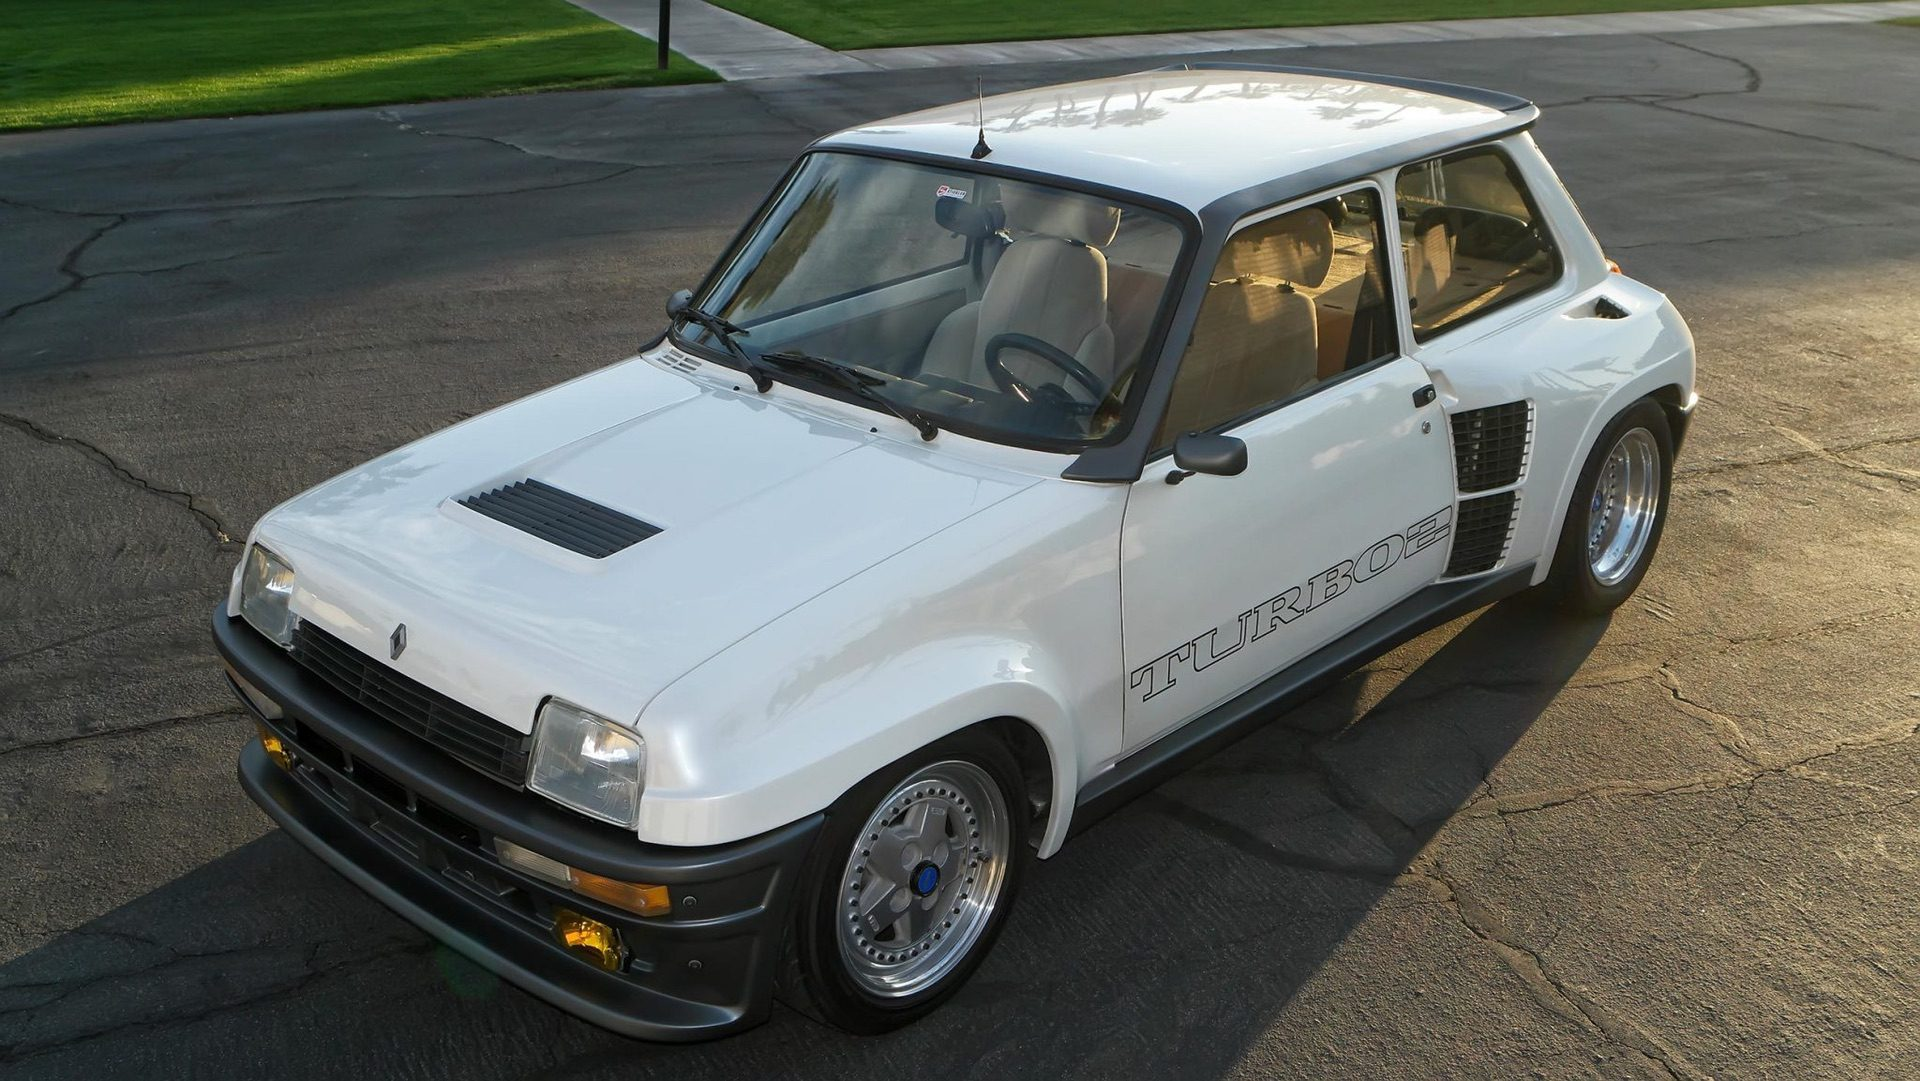 1985_Renault_R5_Turbo_2_rotary-0052